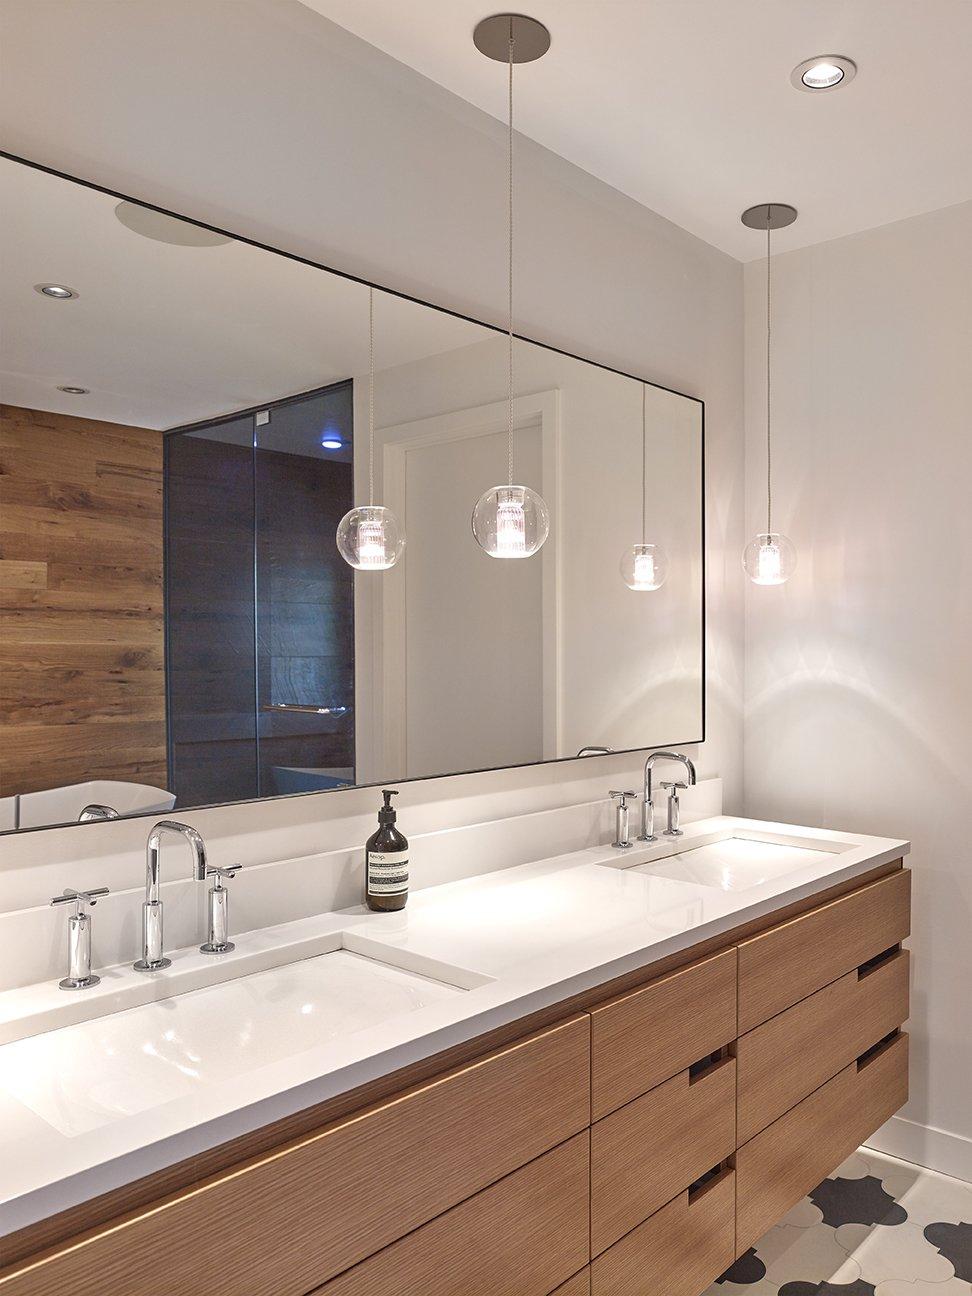 Bath Room, Pendant Lighting, Freestanding Tub, Ceiling Lighting, Cement Tile Floor, Enclosed Shower, Two Piece Toilet, Engineered Quartz Counter, and Undermount Sink Master Bath  Crestwood Re-Model by Mindy Gudzinski Design